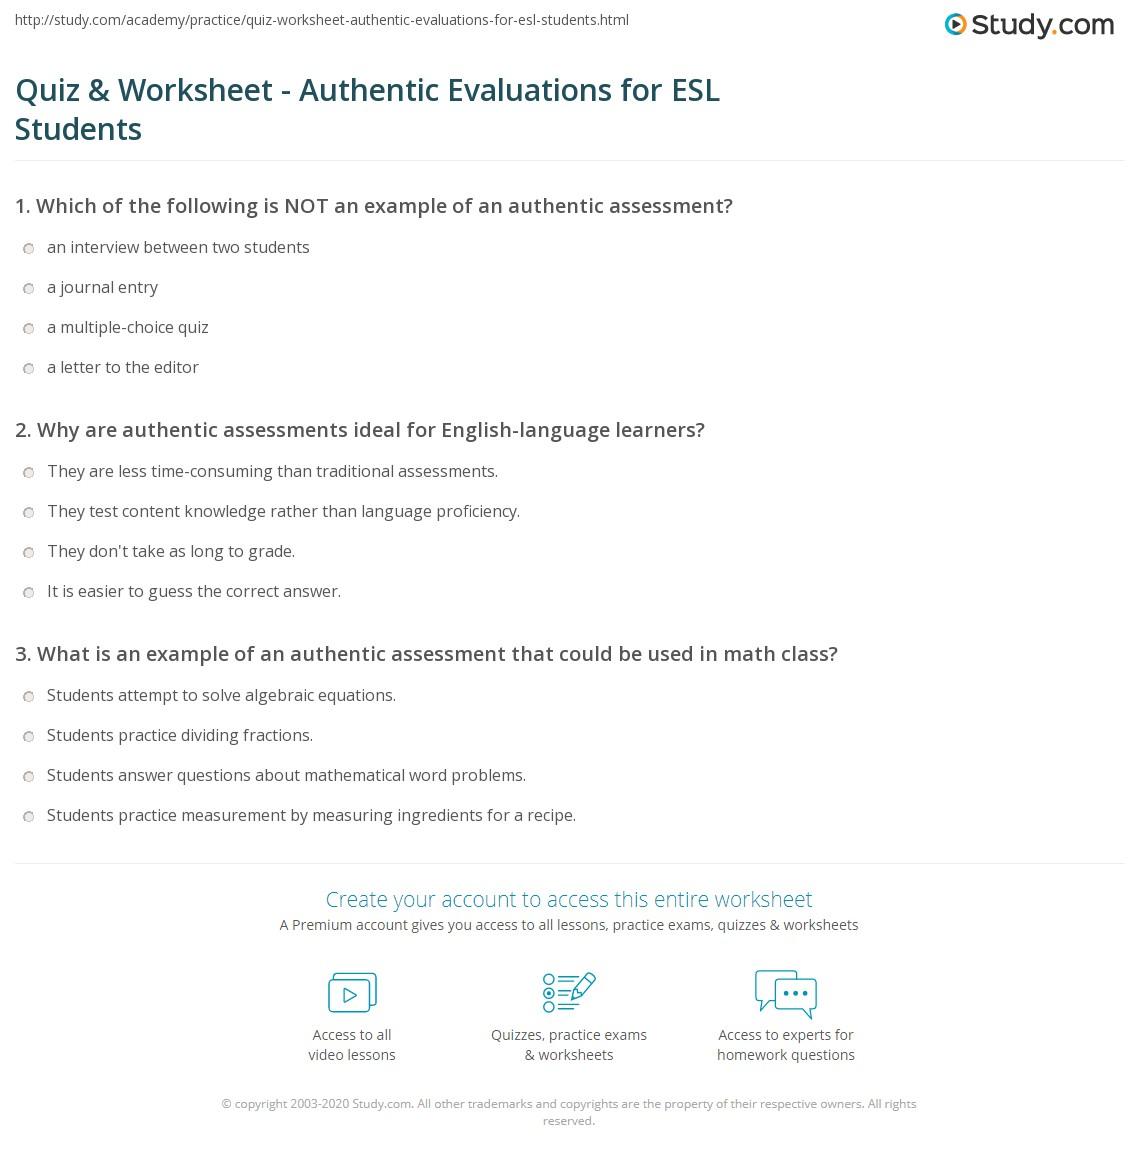 Quiz Worksheet Authentic Evaluations for ESL Students – Esl Practice Worksheets